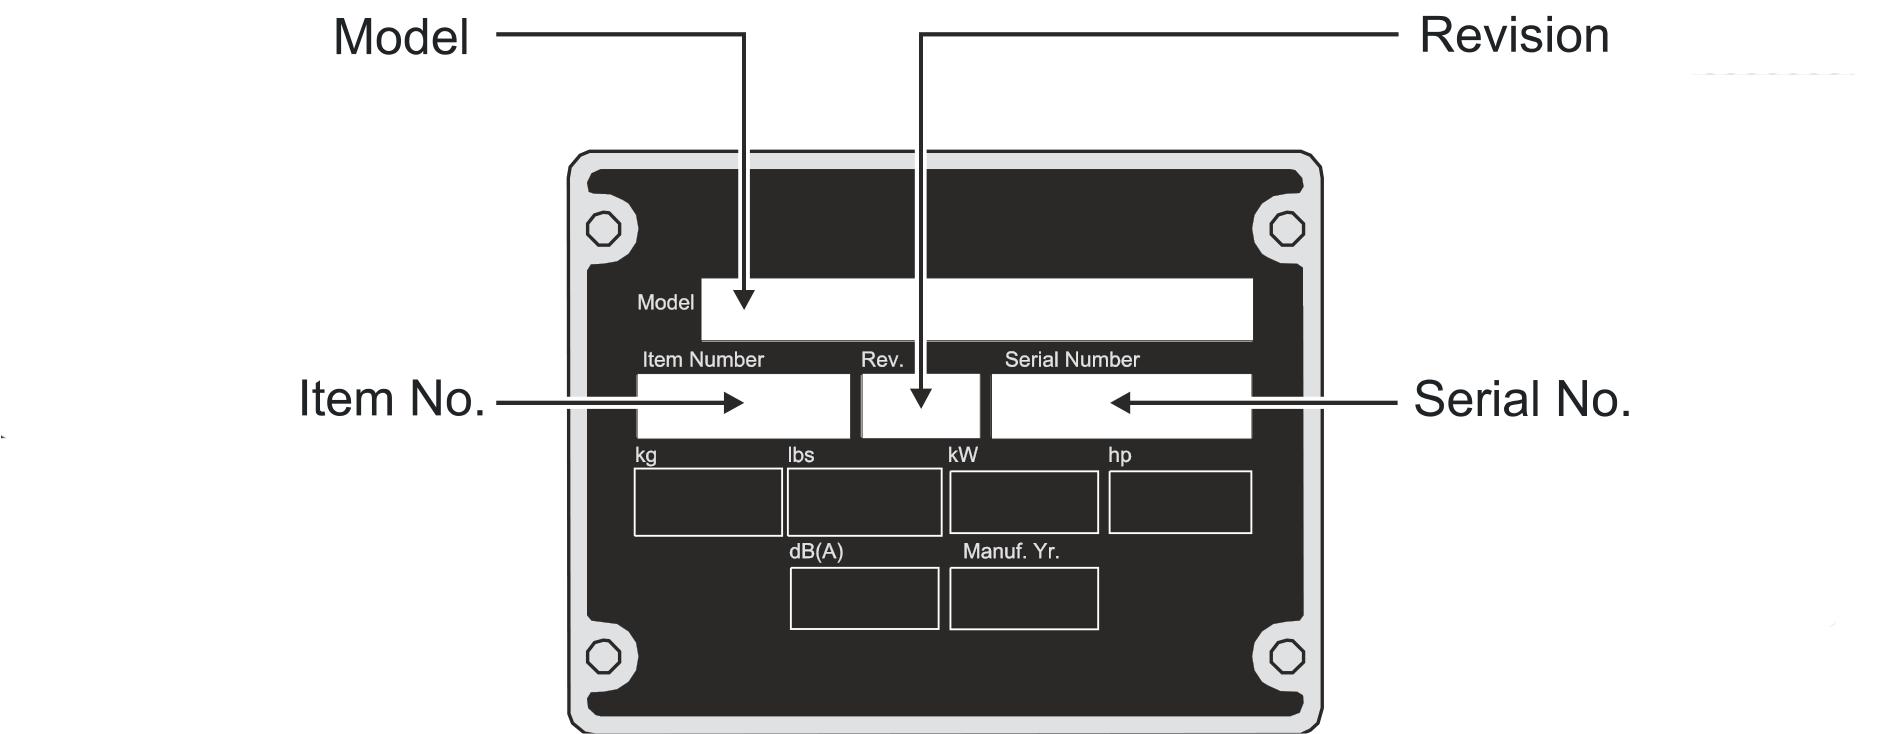 wacker bs45y parts manual parts diagram rh stores dhsequipmentparts com Wacker Neuson WP 1550 Parts Manual Wacker Neuson Parts Lookup